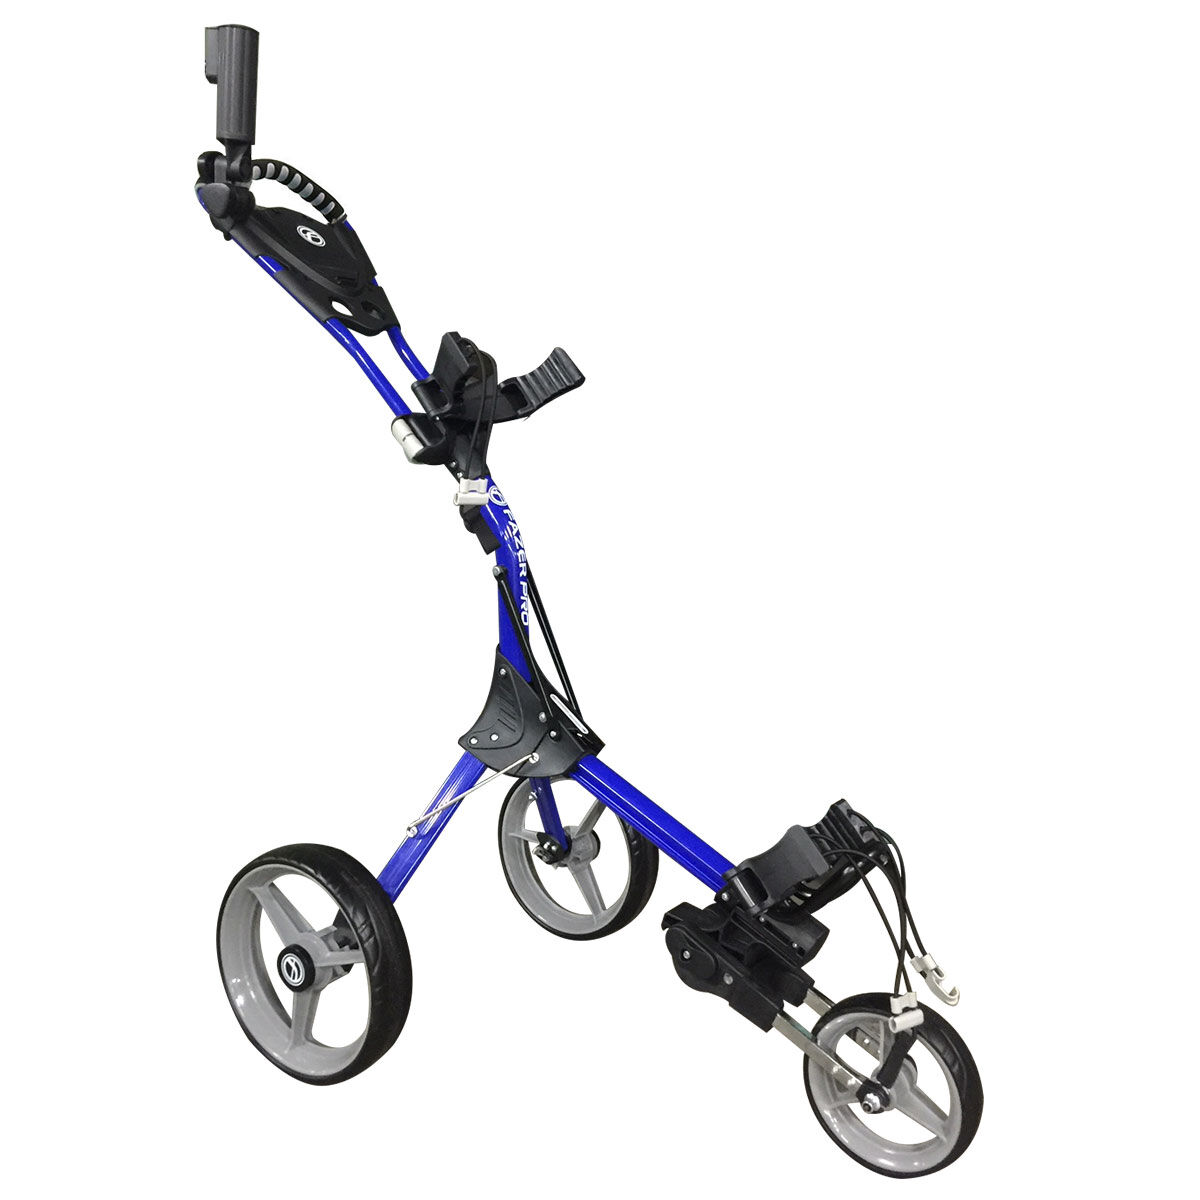 Fazer Pro Compact Push Golf Trolley, Blue, One Size | American Golf